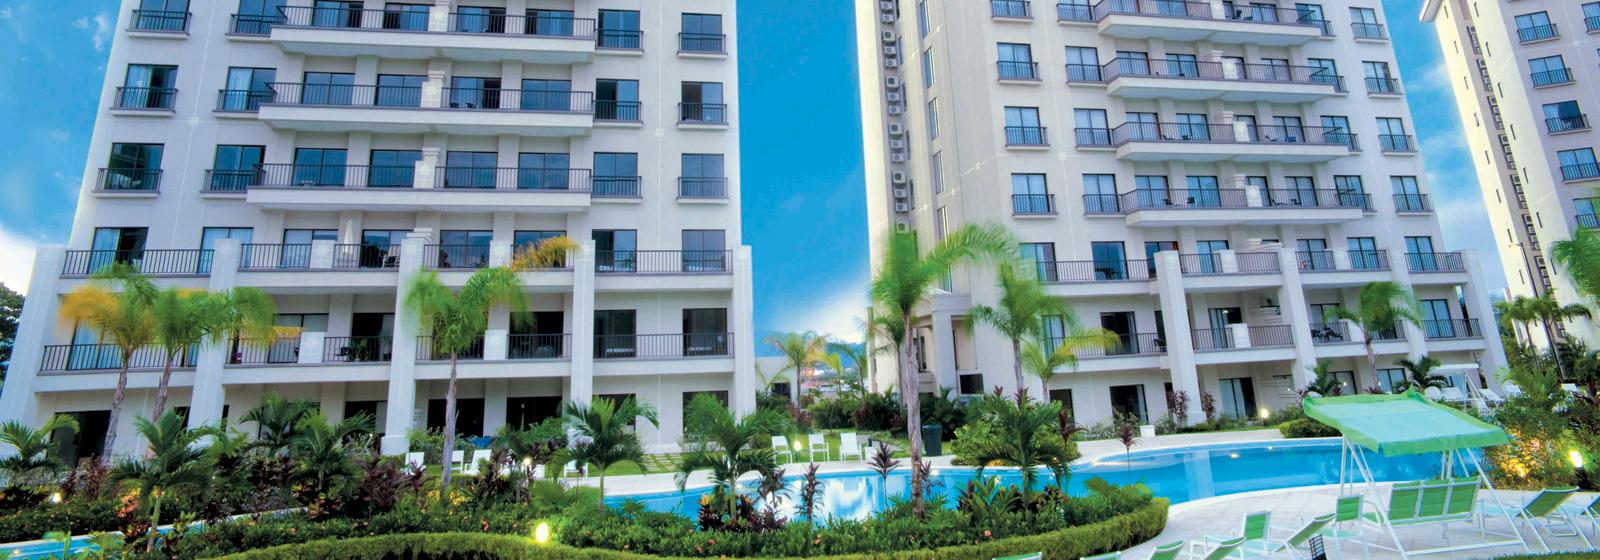 Jaco Beach Costa Rica Hotels Newatvs Info